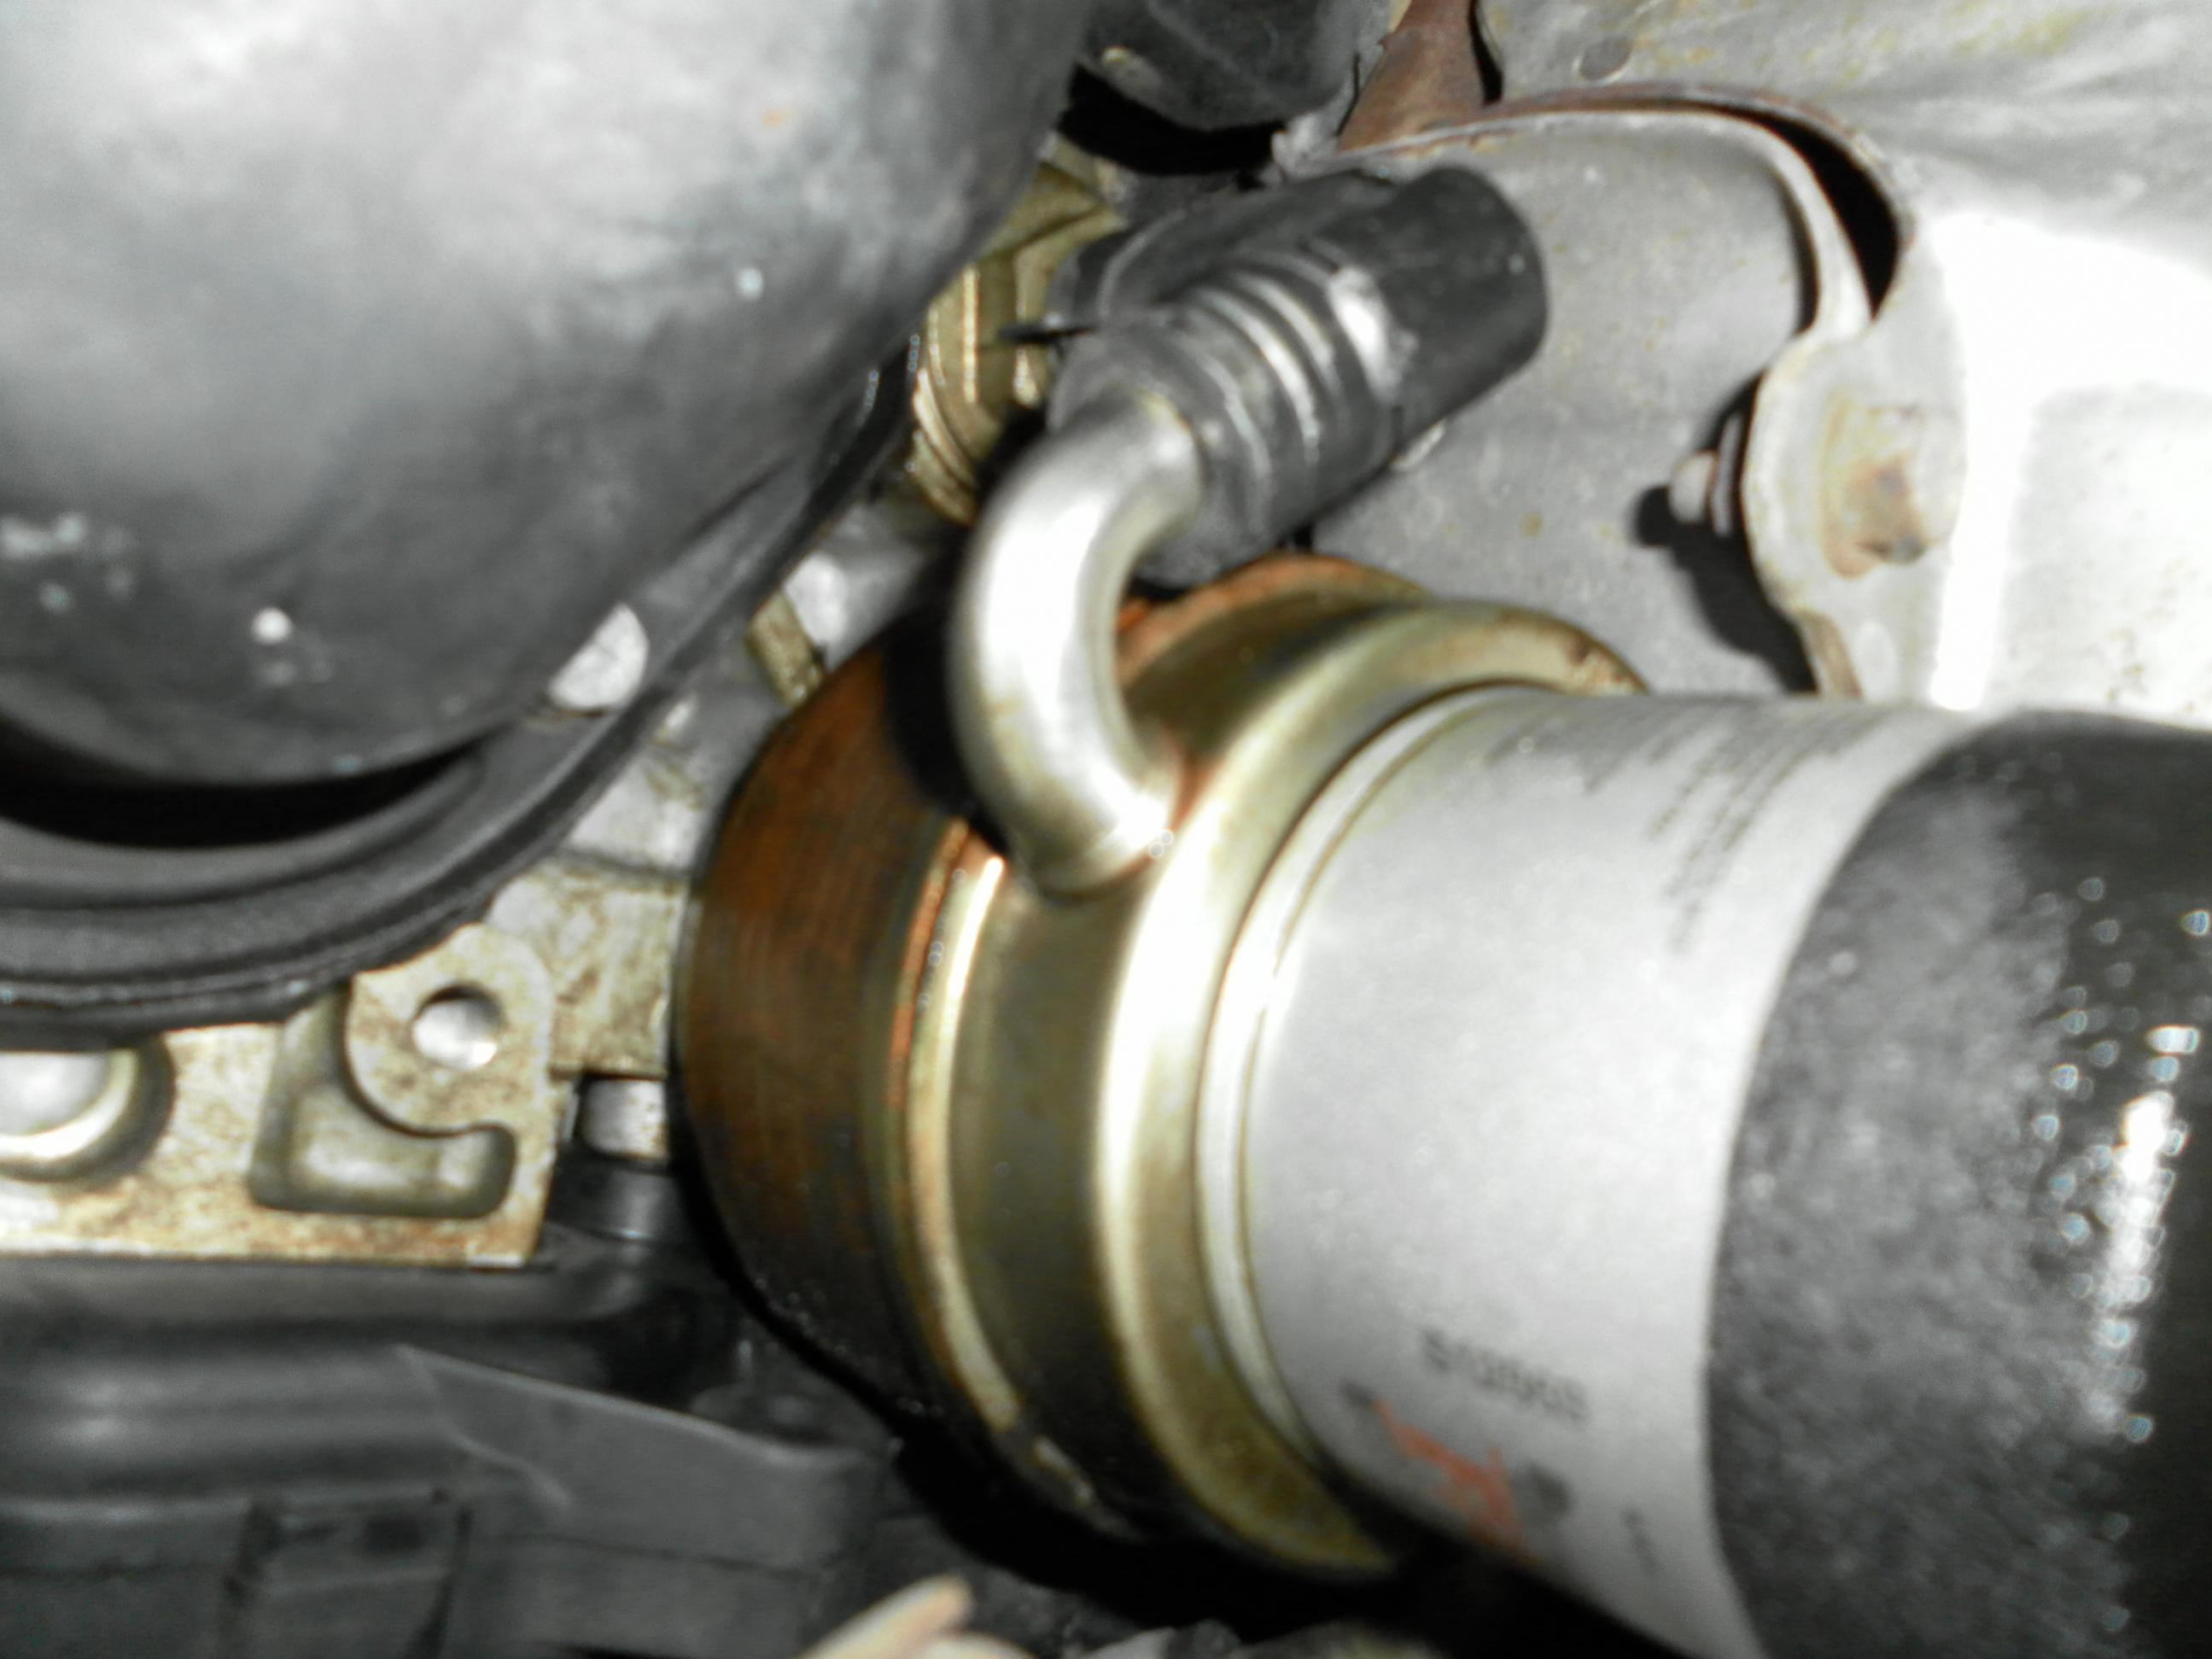 6 Volt Voltage Regulator Wiring Diagram besides 2012 Kia Forte Wiring Diagram likewise Car Alarm Valet Switch together with Nissan Altima Fuse Box Diagram additionally Dual Transmission Truck. on 2005 subaru legacy alternator wiring diagram